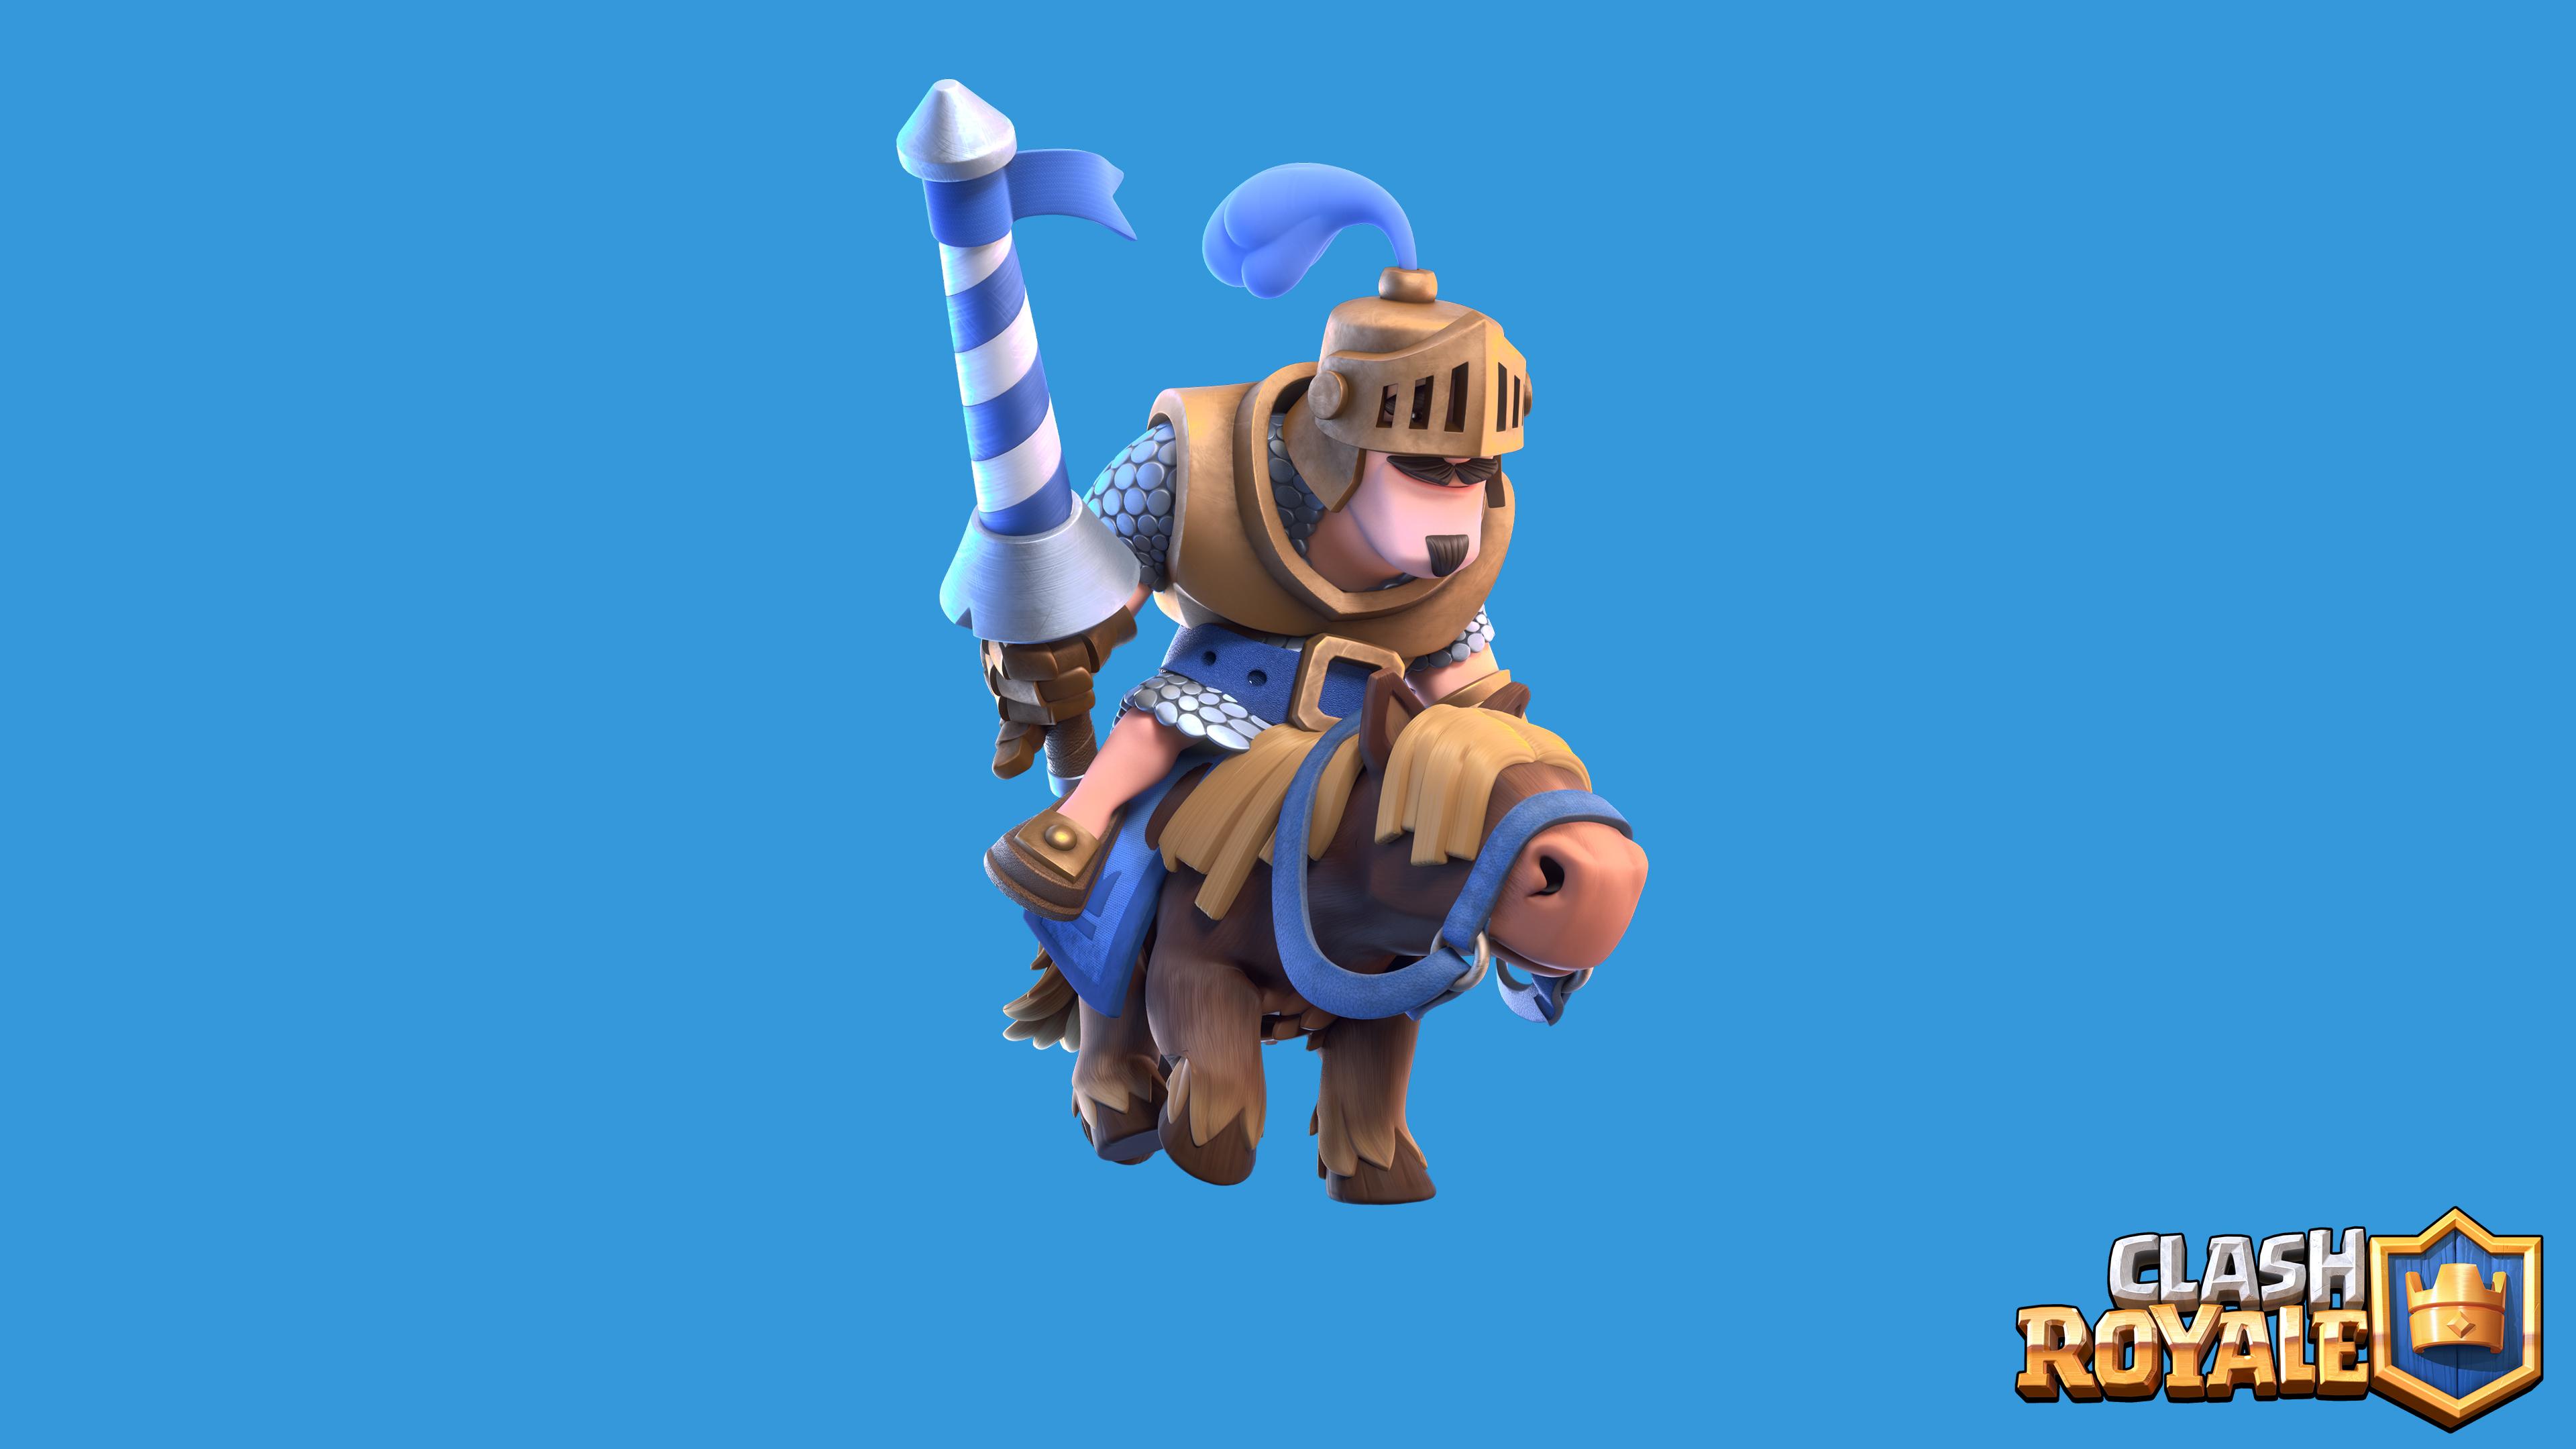 Clash Royale: Clash Royale Blue Prince 3, HD Games, 4k Wallpapers